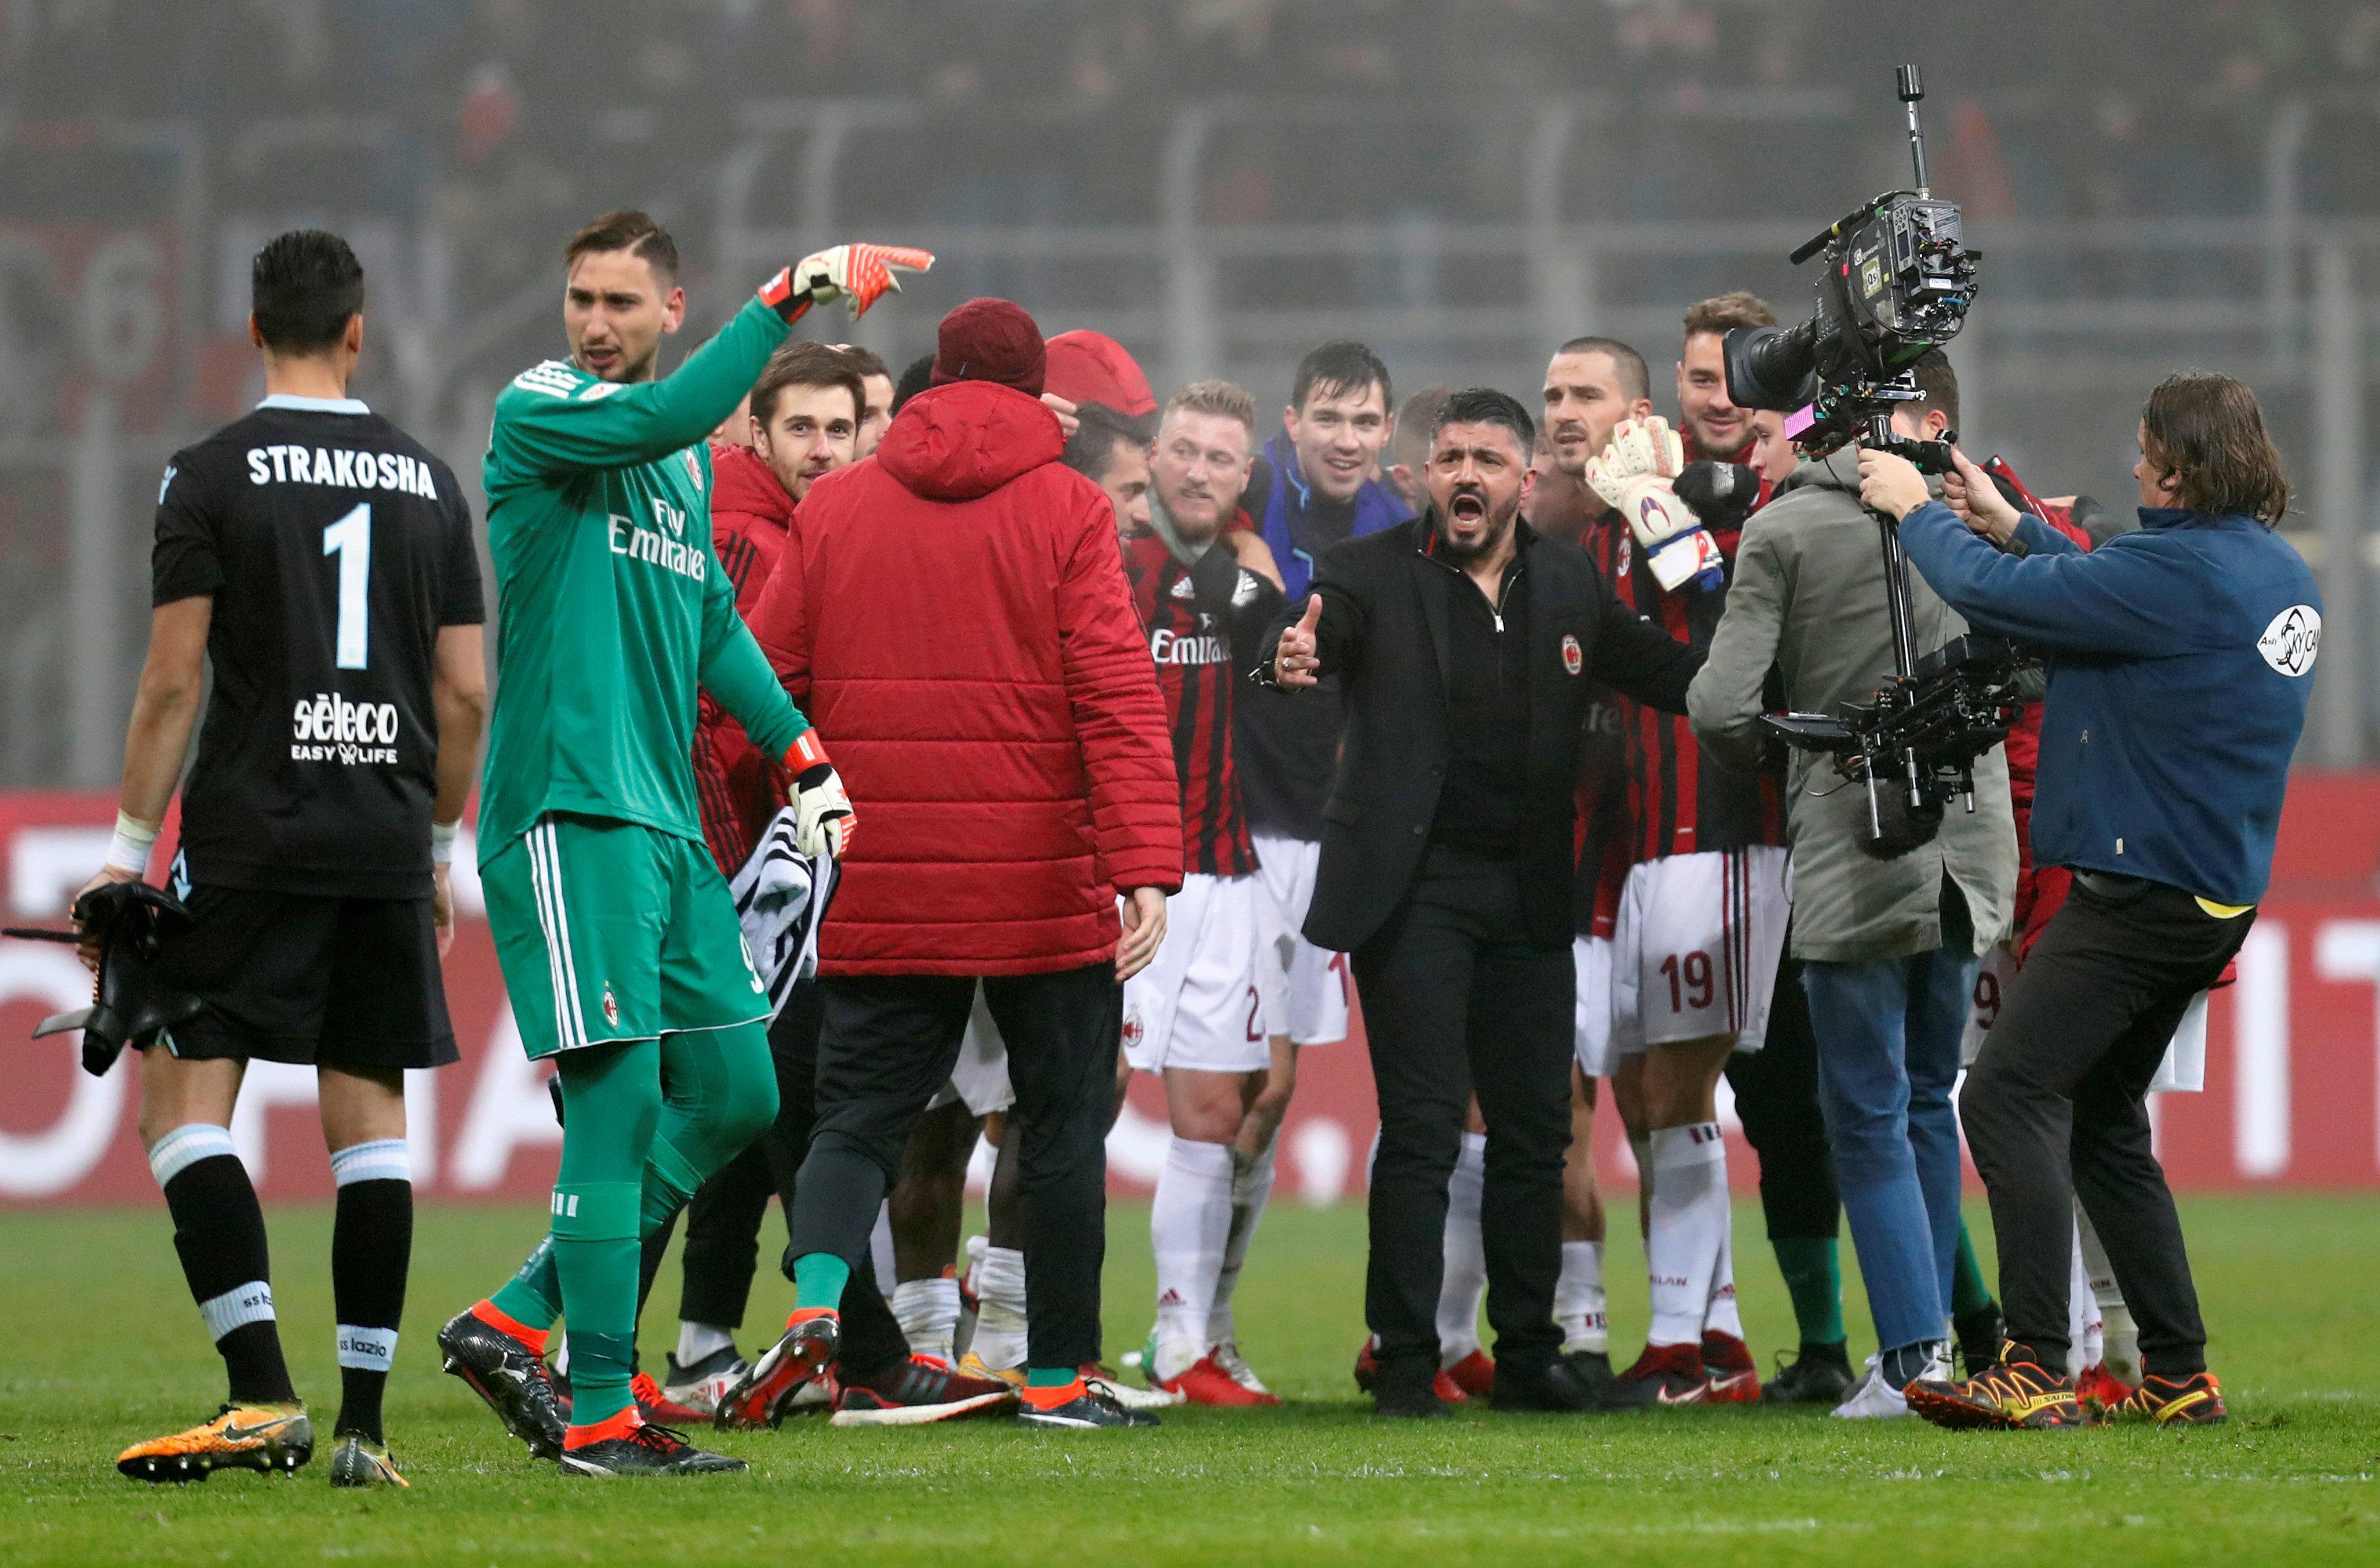 The Milan legend has improved team spirit